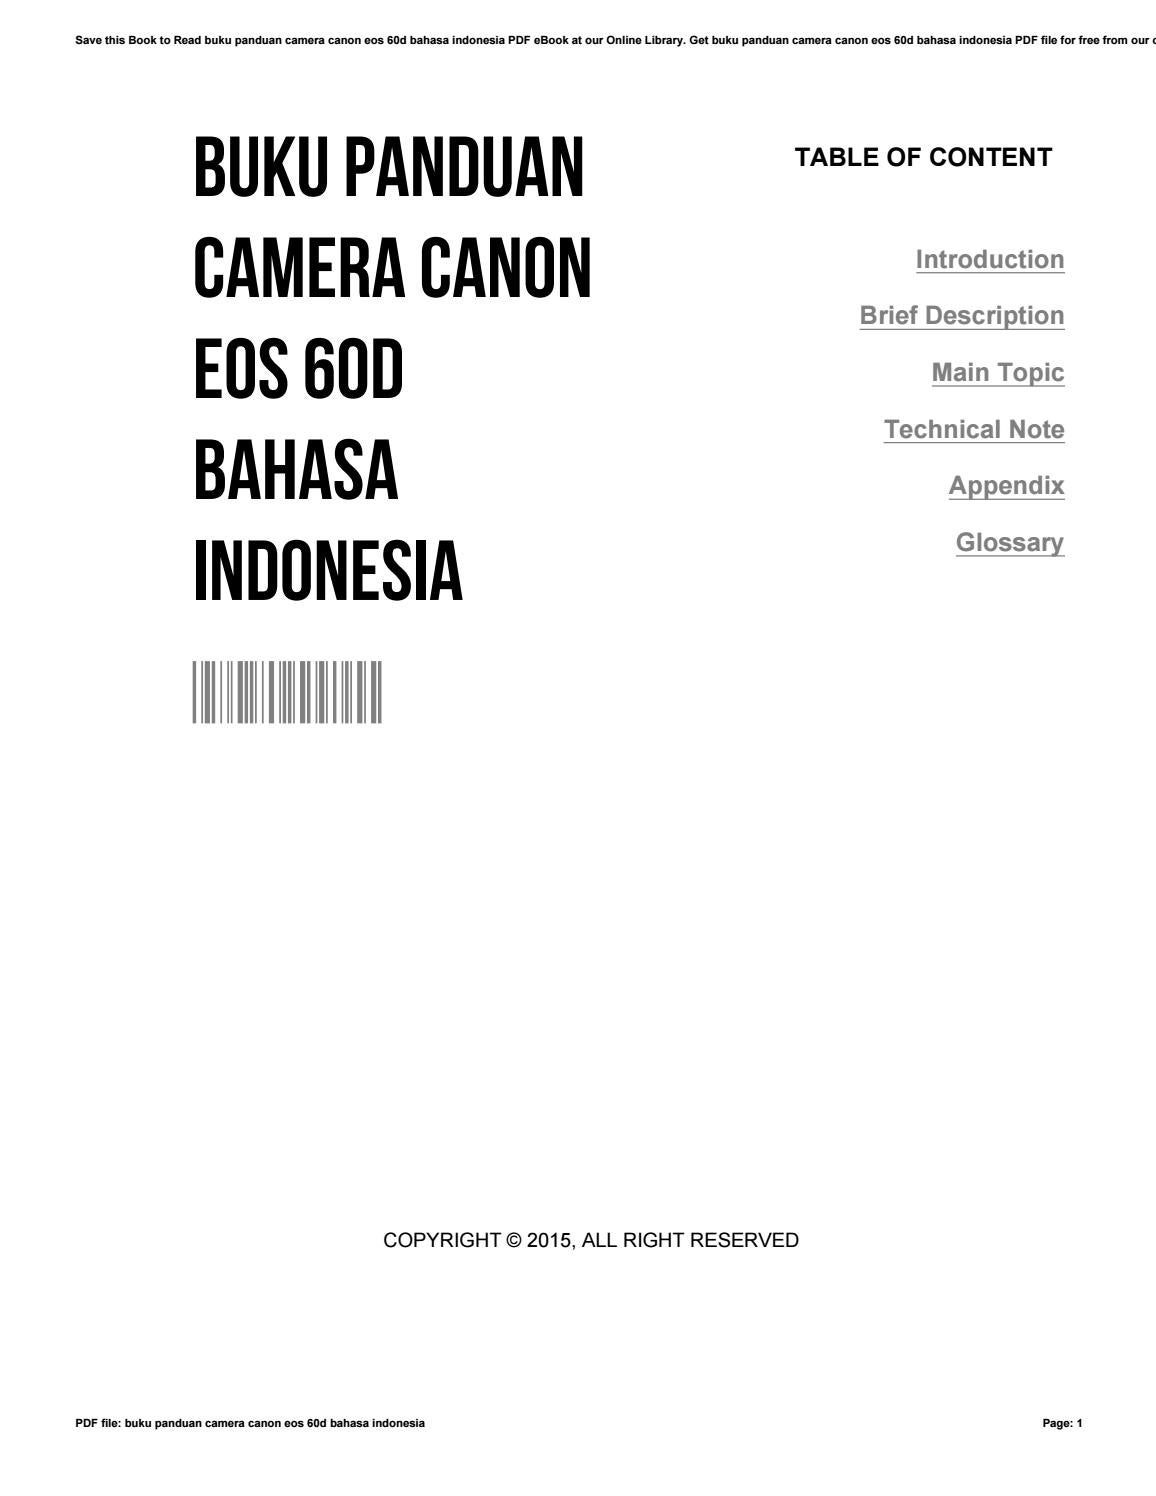 Buku panduan camera canon eos 60d bahasa indonesia by